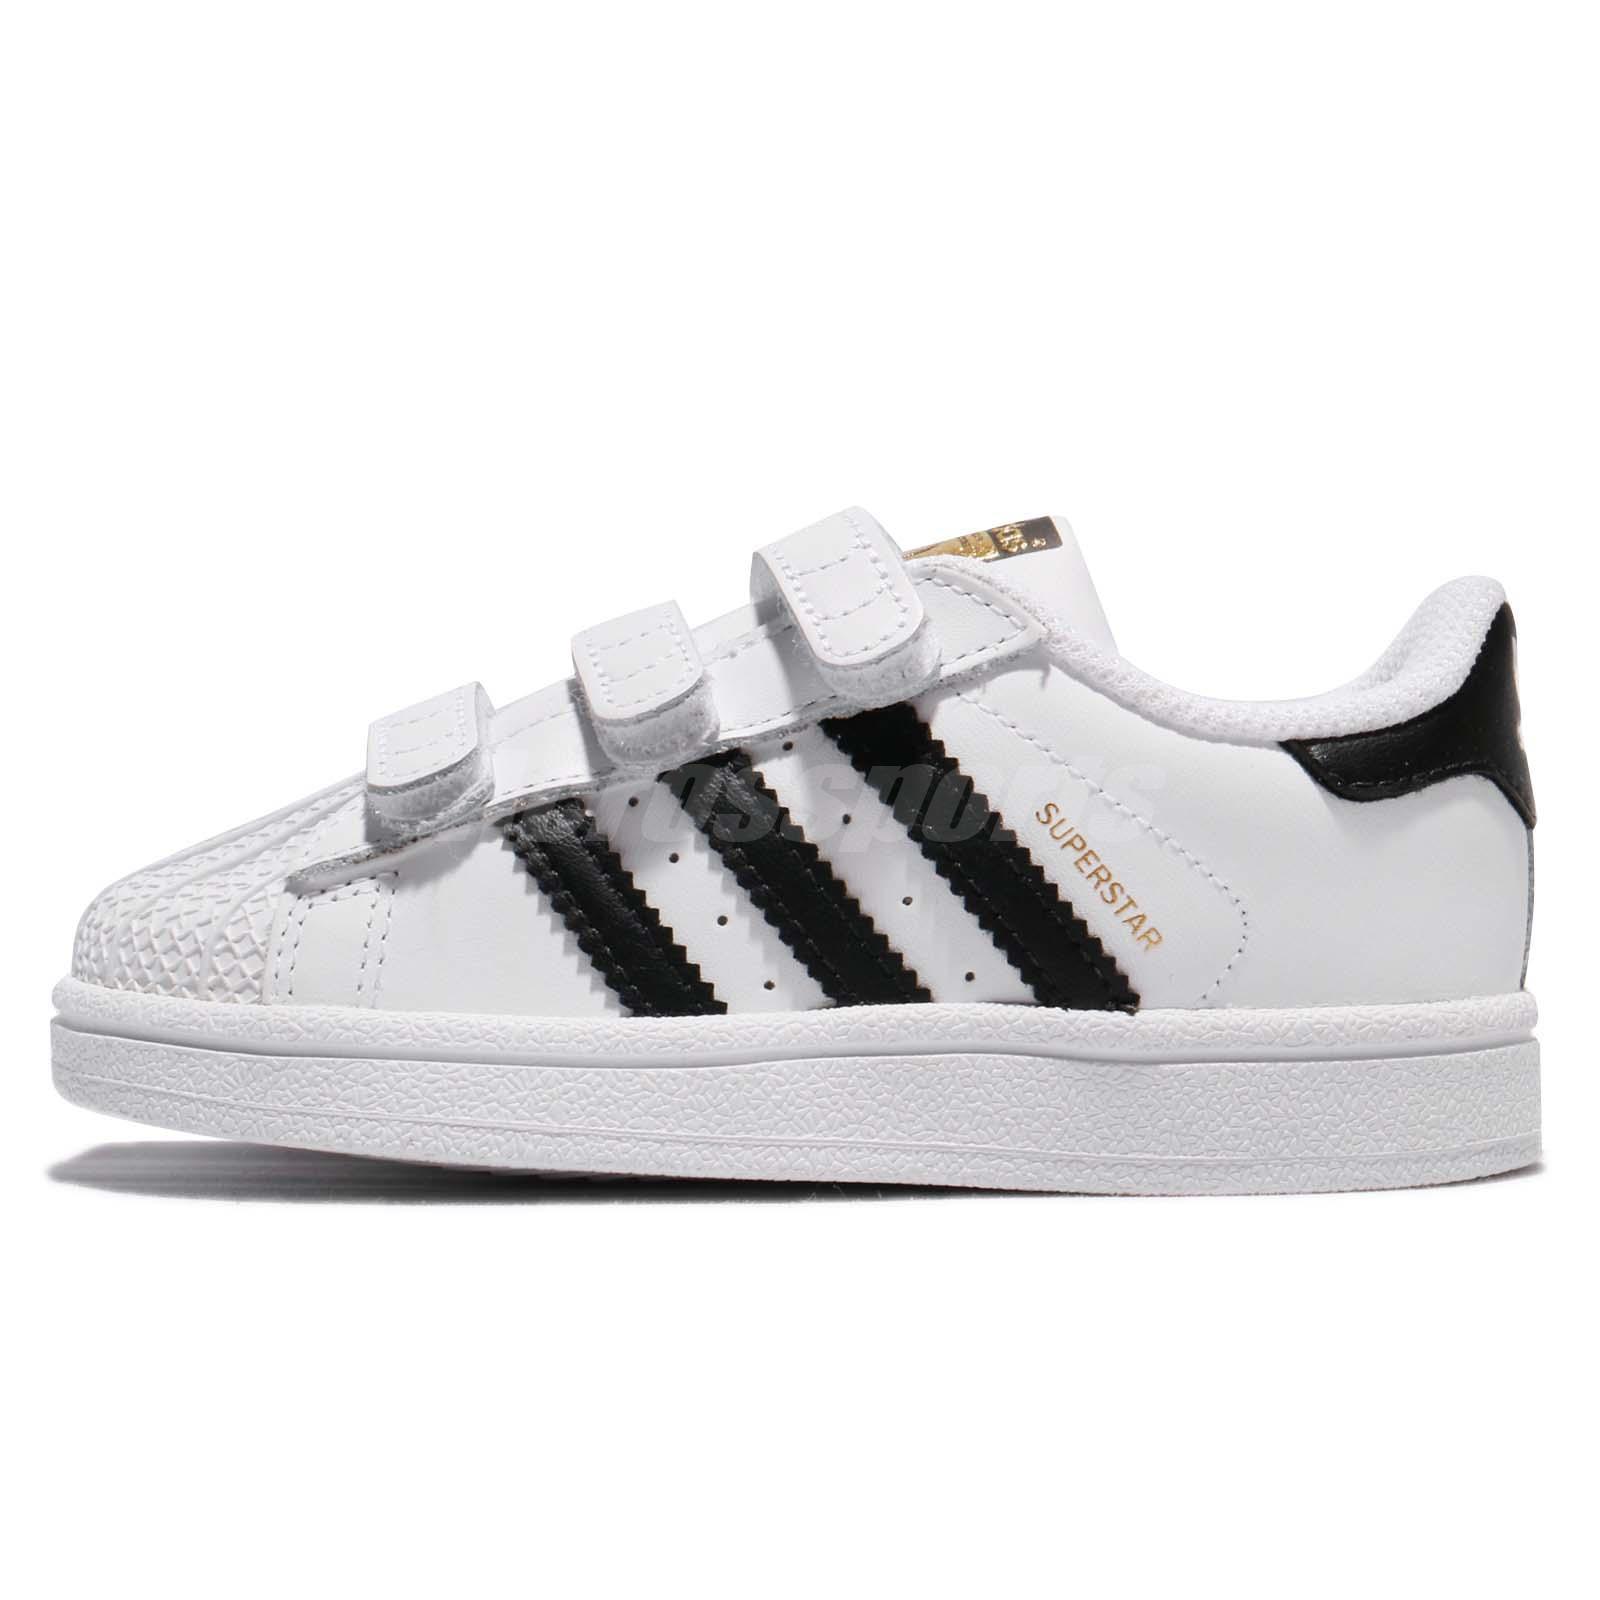 Zapatillas para os ni ñ peque ñ os - adidas superstar di originali in bianco